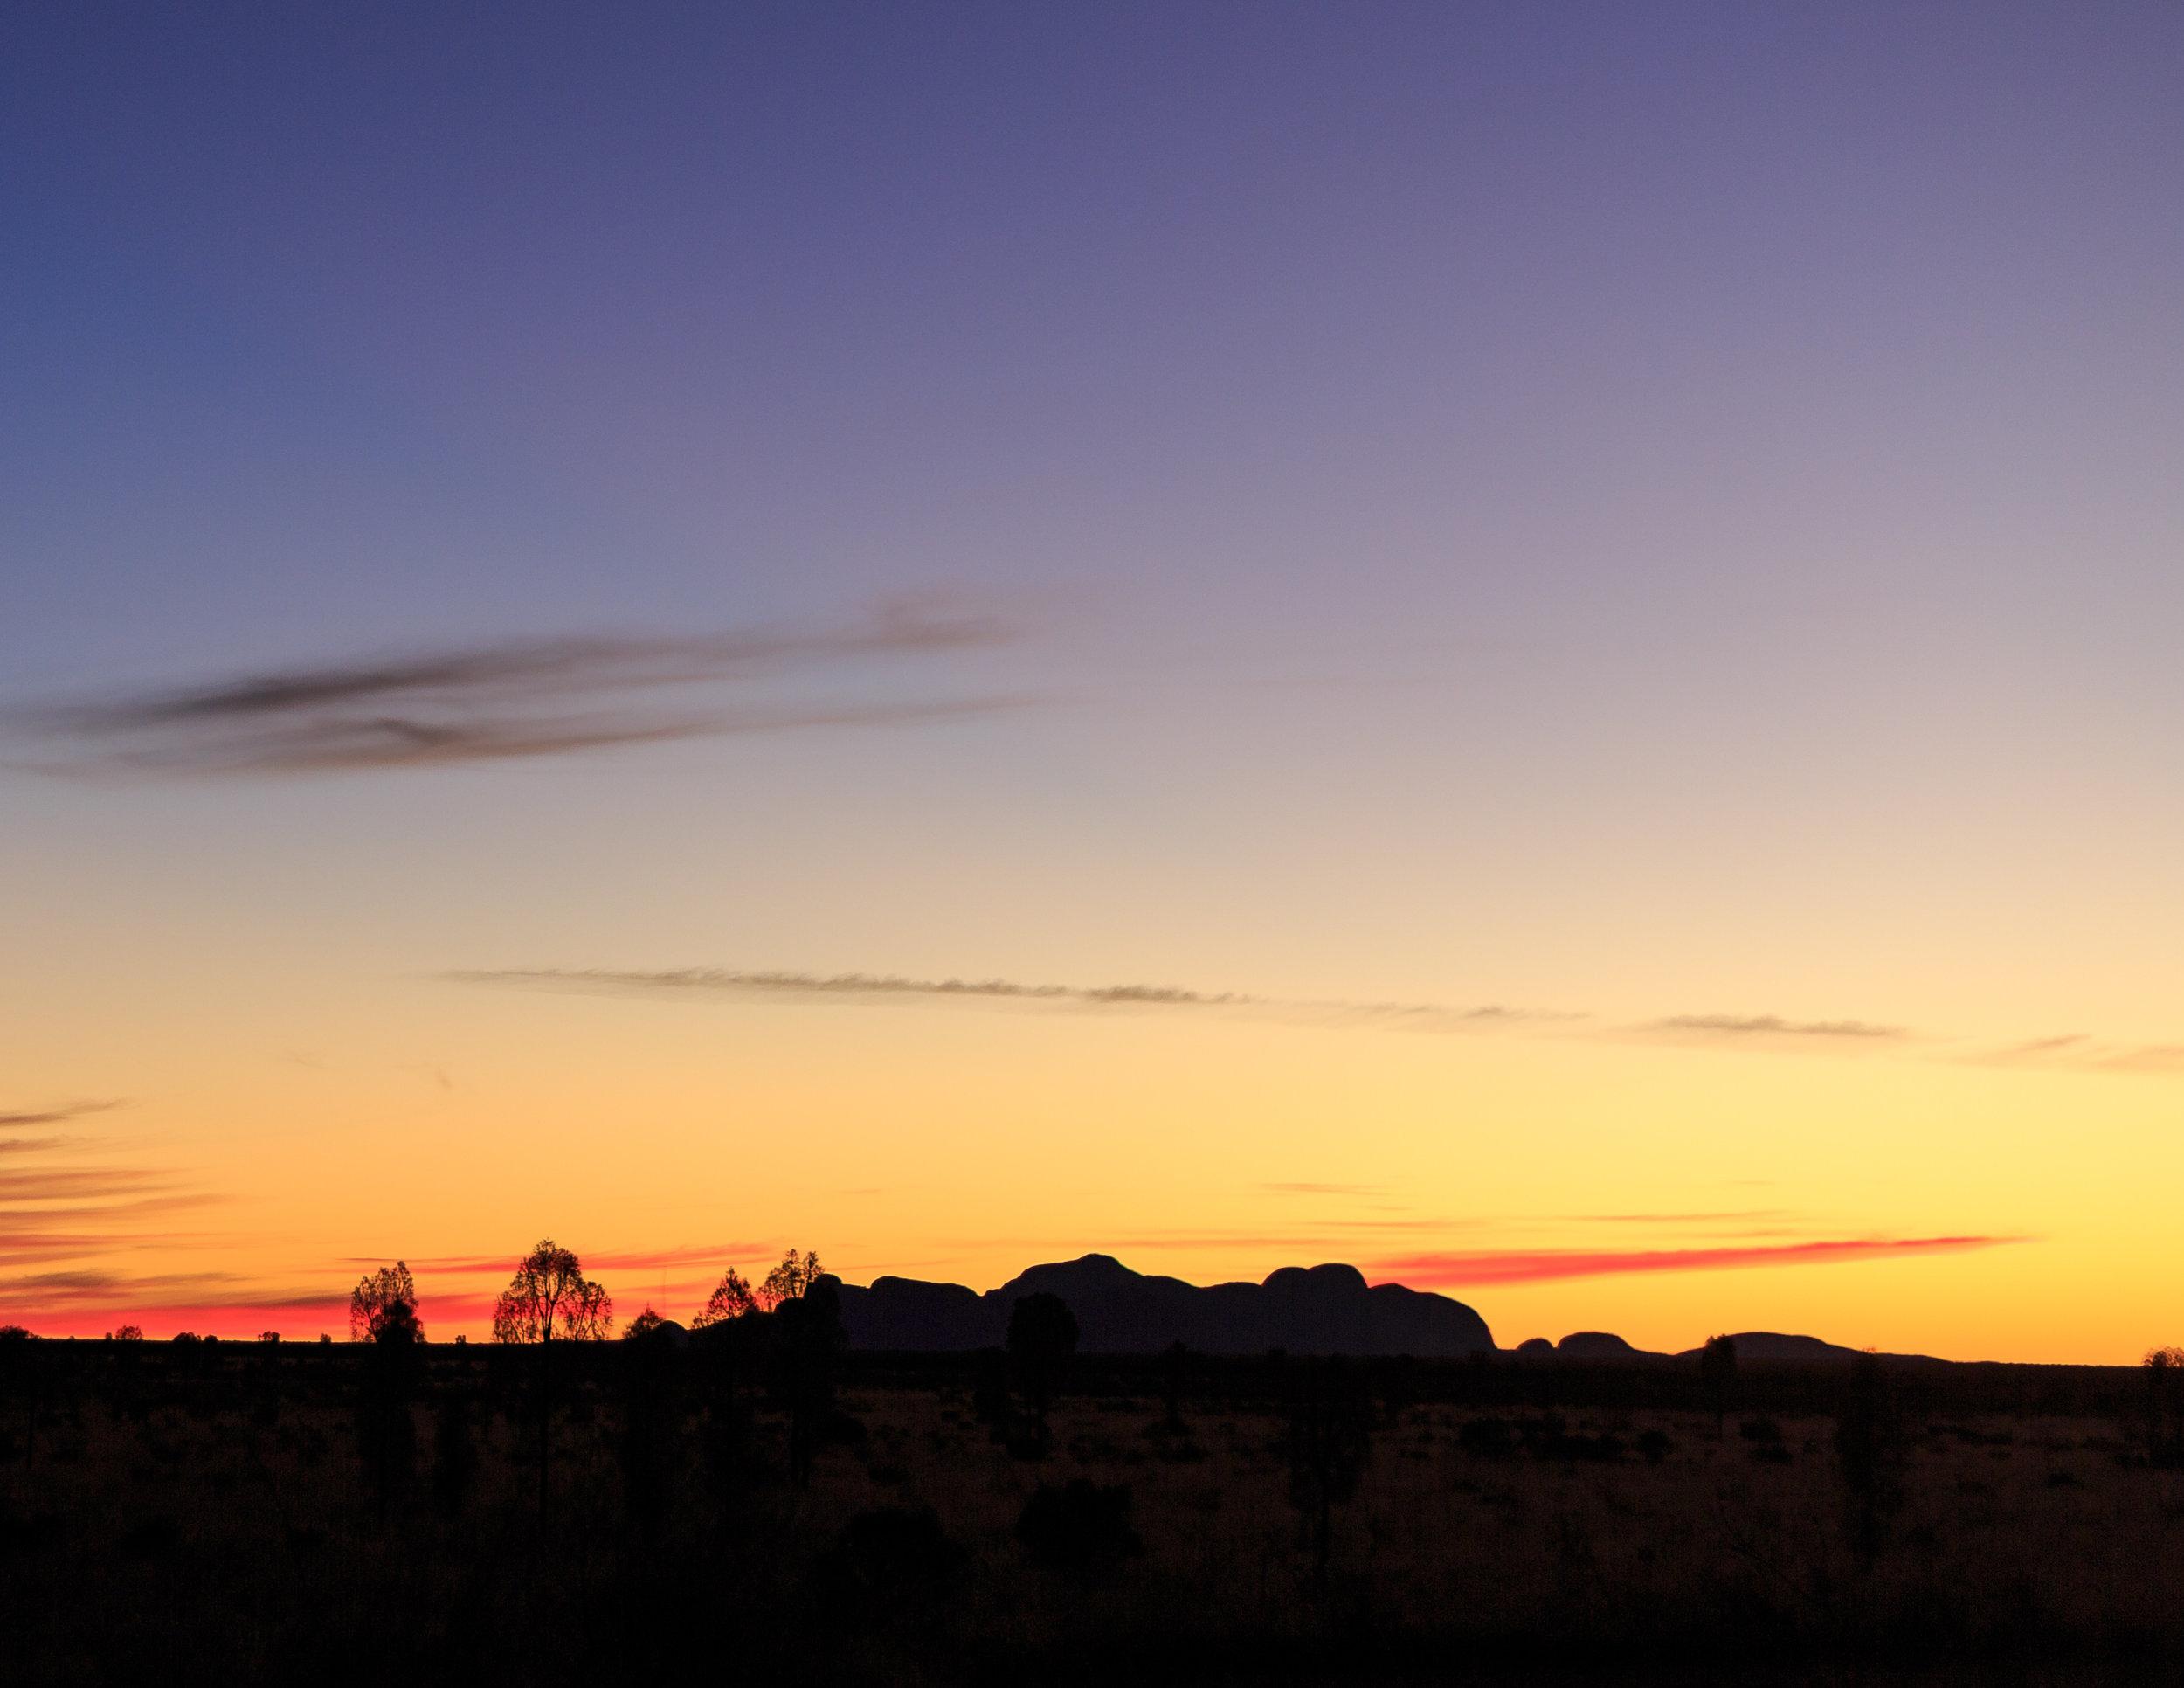 Kata Tjuta at sunset